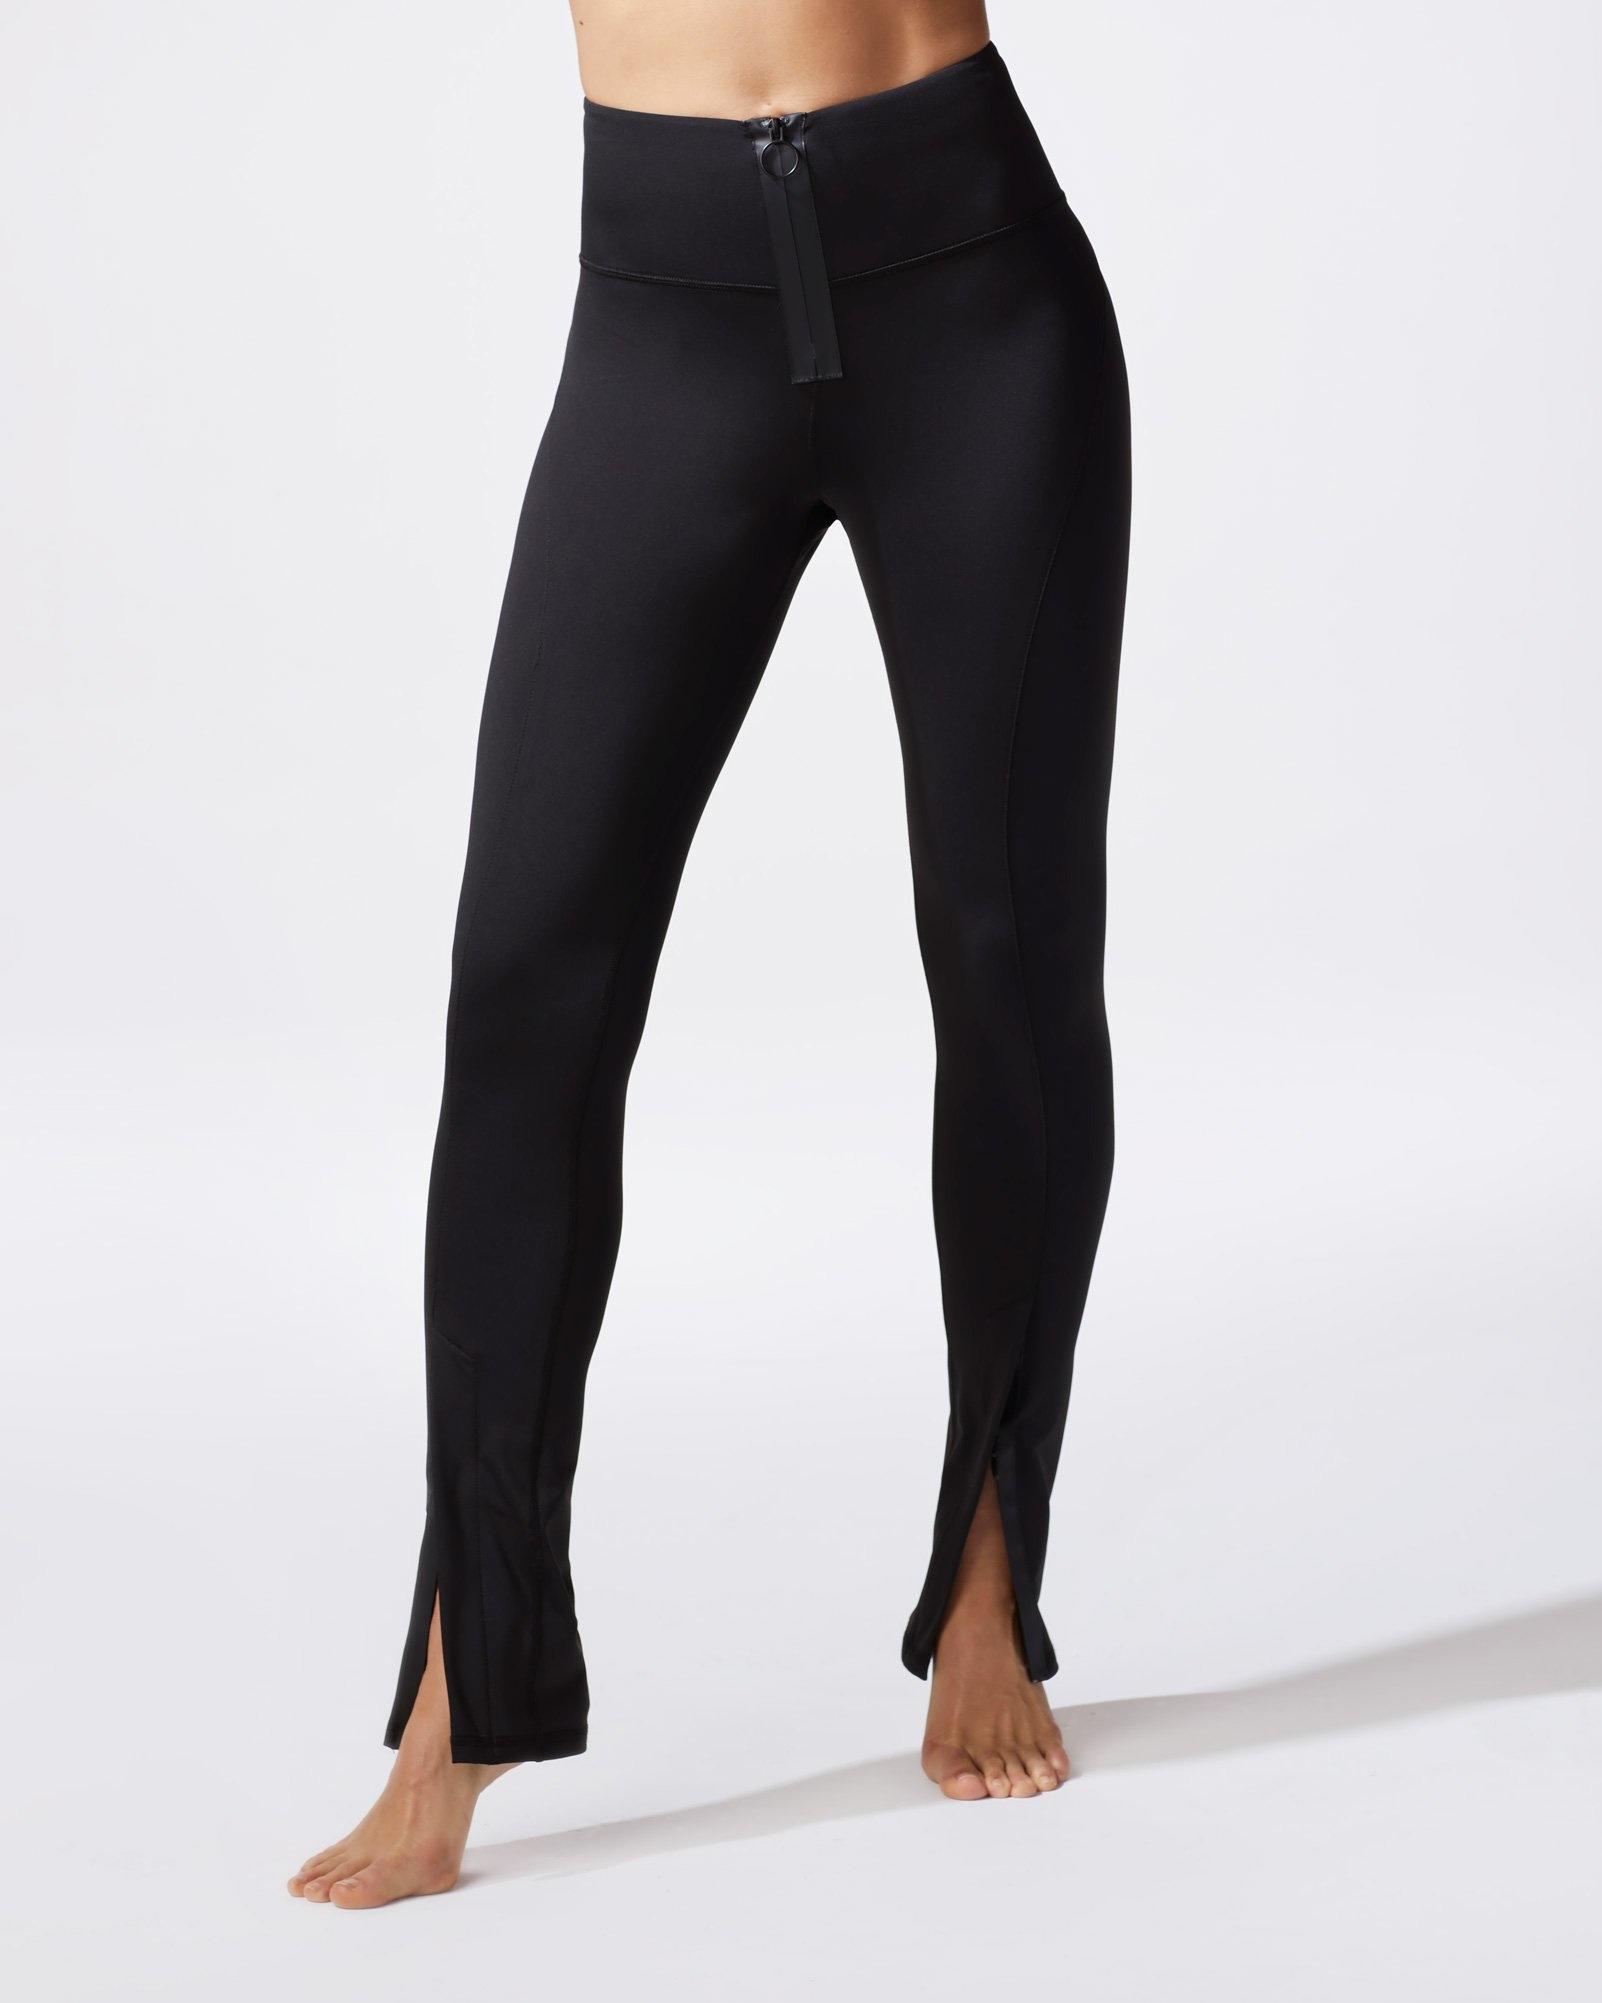 Michi  Nocturnal zip legging